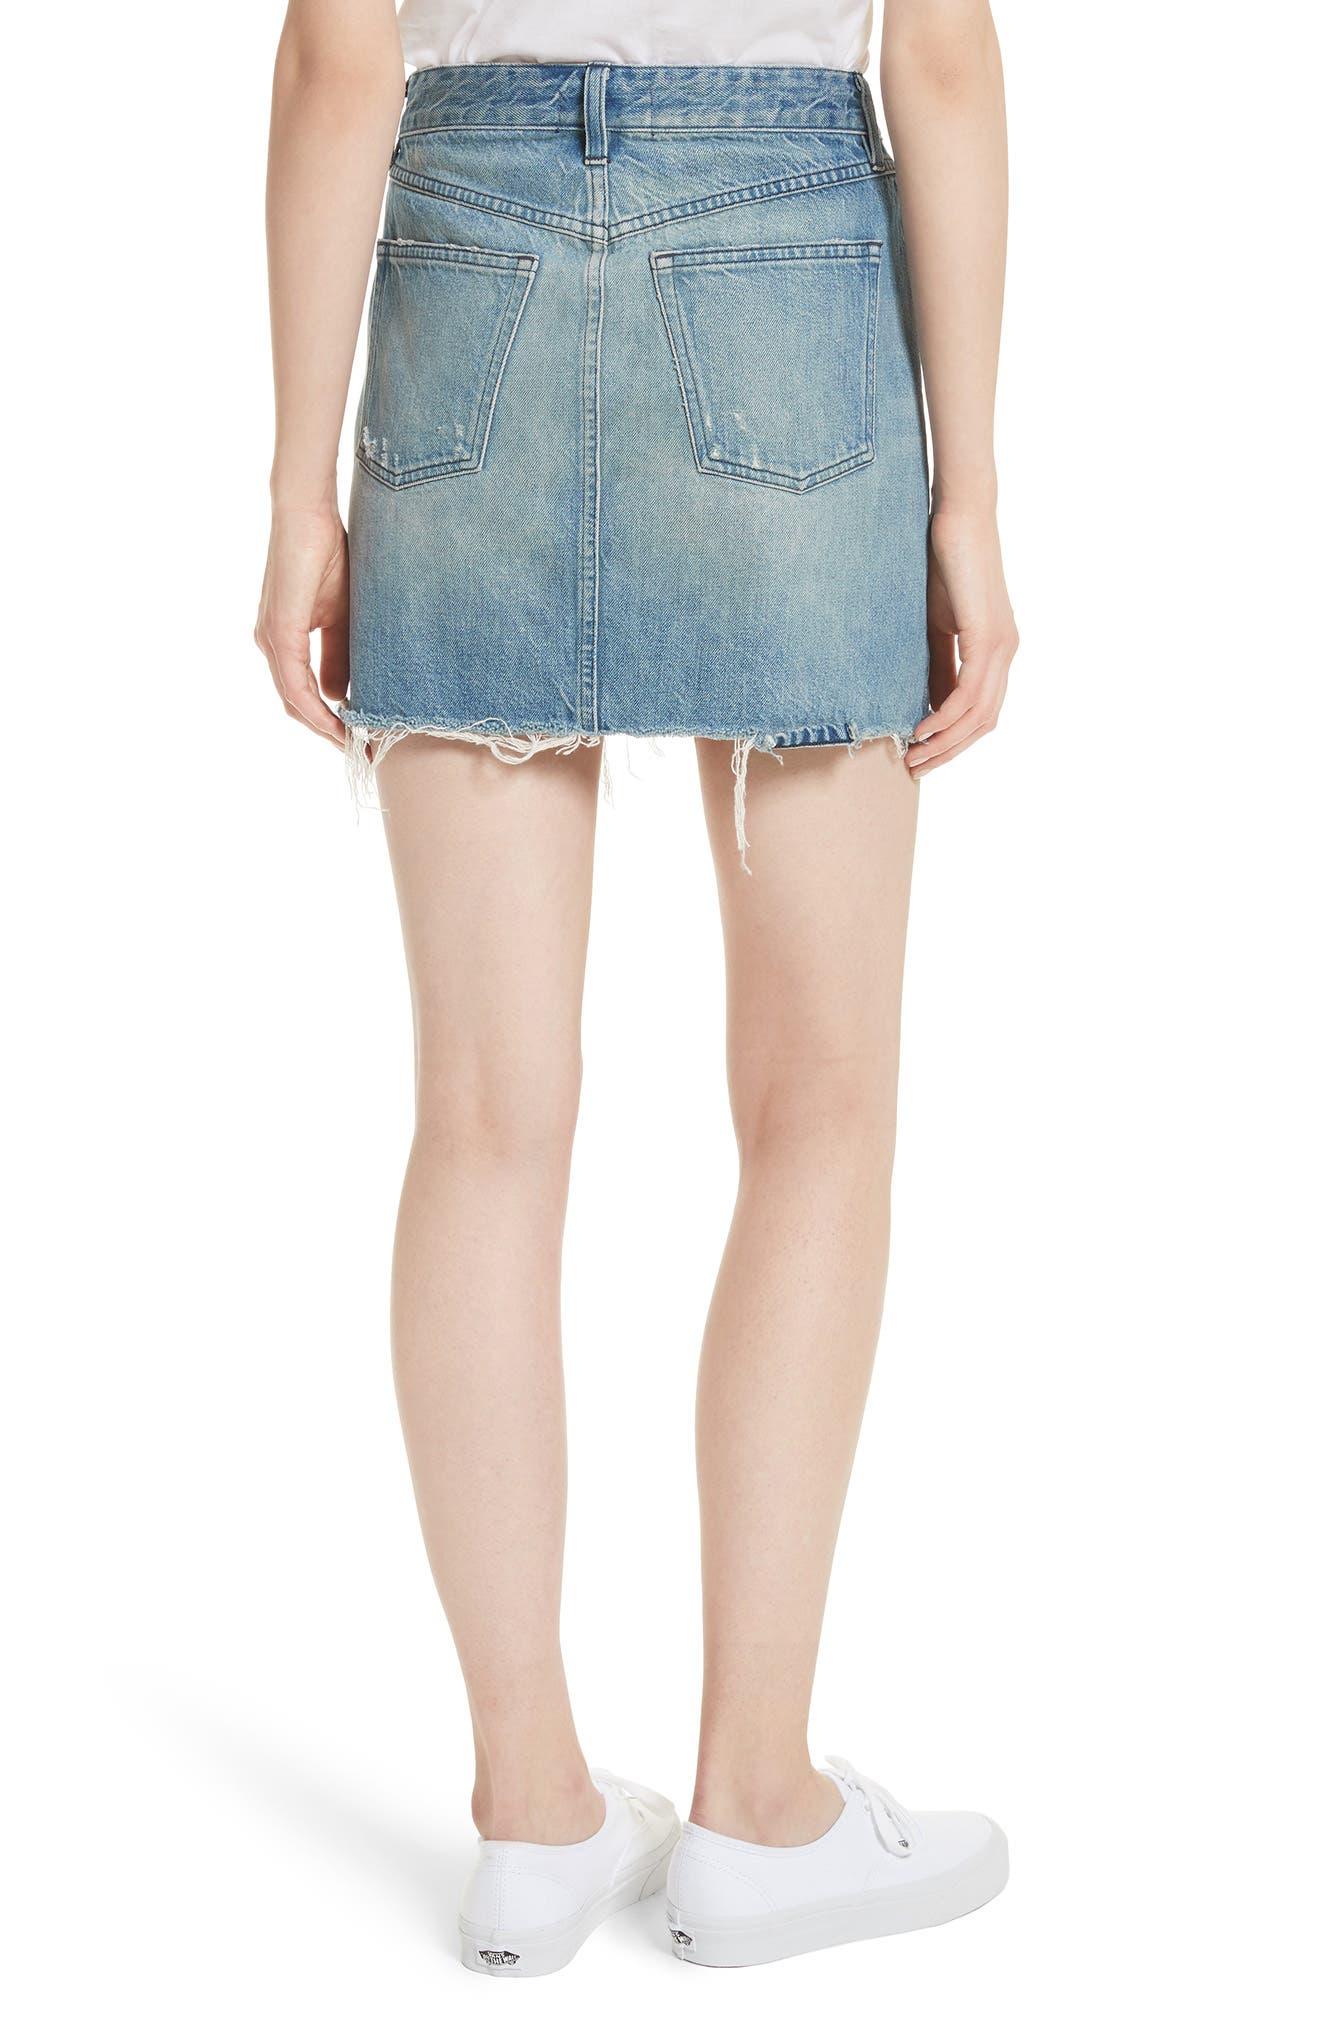 Celine Distressed Denim Skirt,                             Alternate thumbnail 2, color,                             Laz